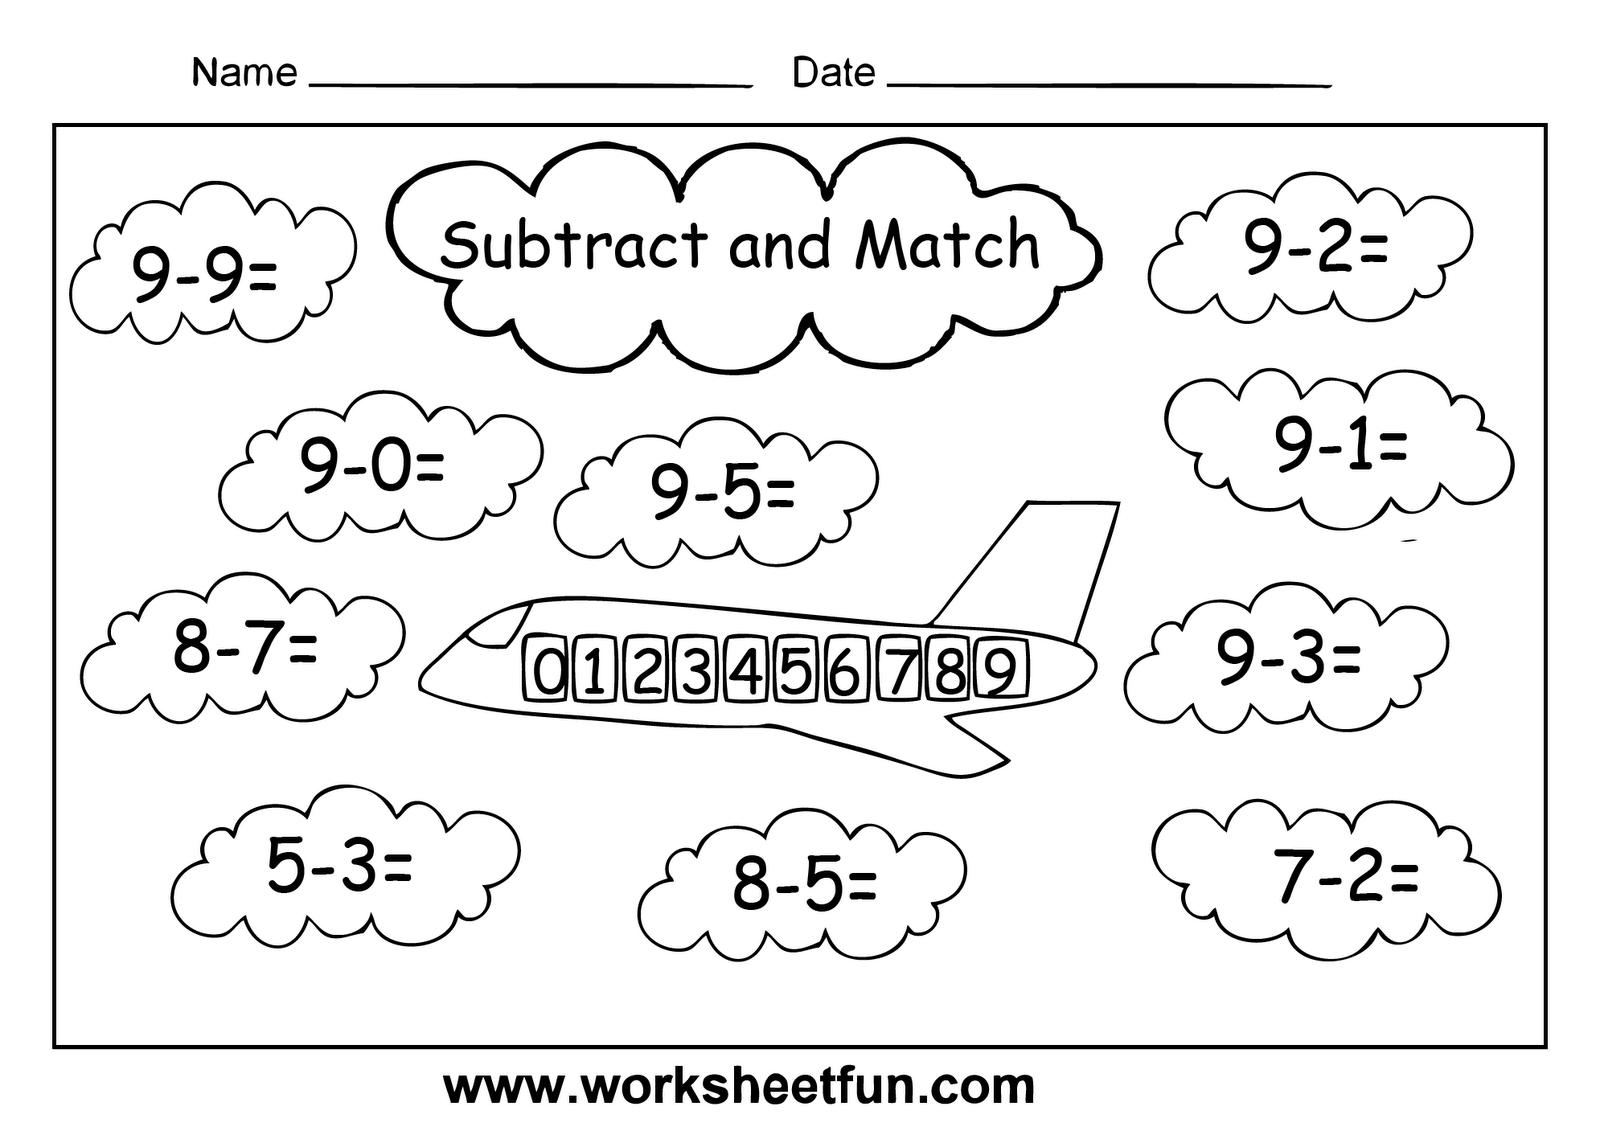 small resolution of Worksheetfun - FREE PRINTABLE WORKSHEETS   1st grade math worksheets